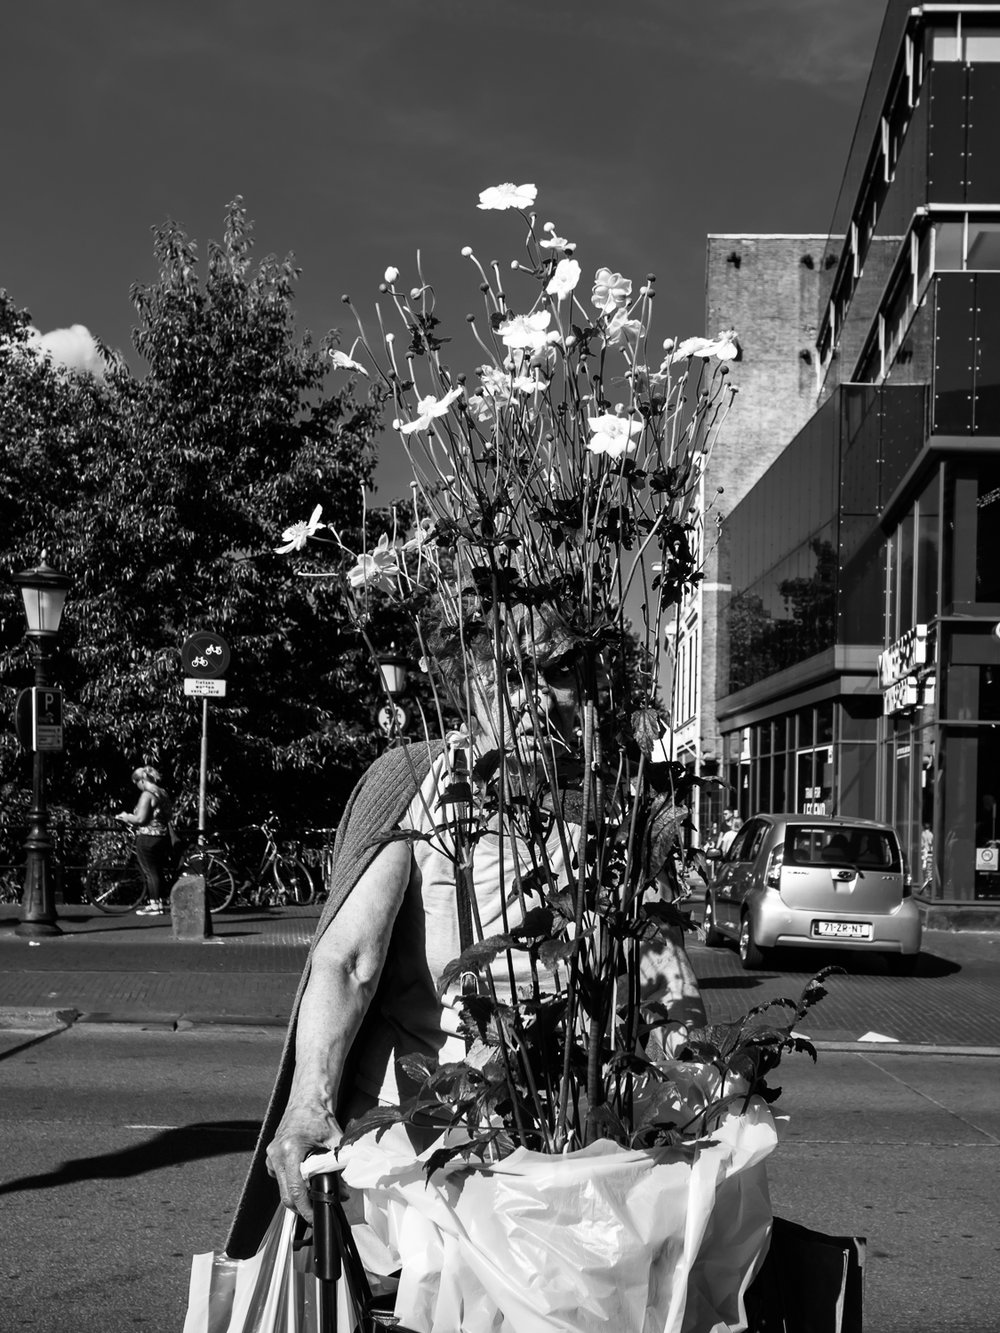 fokko muller street photography - 160924 - 002.jpg